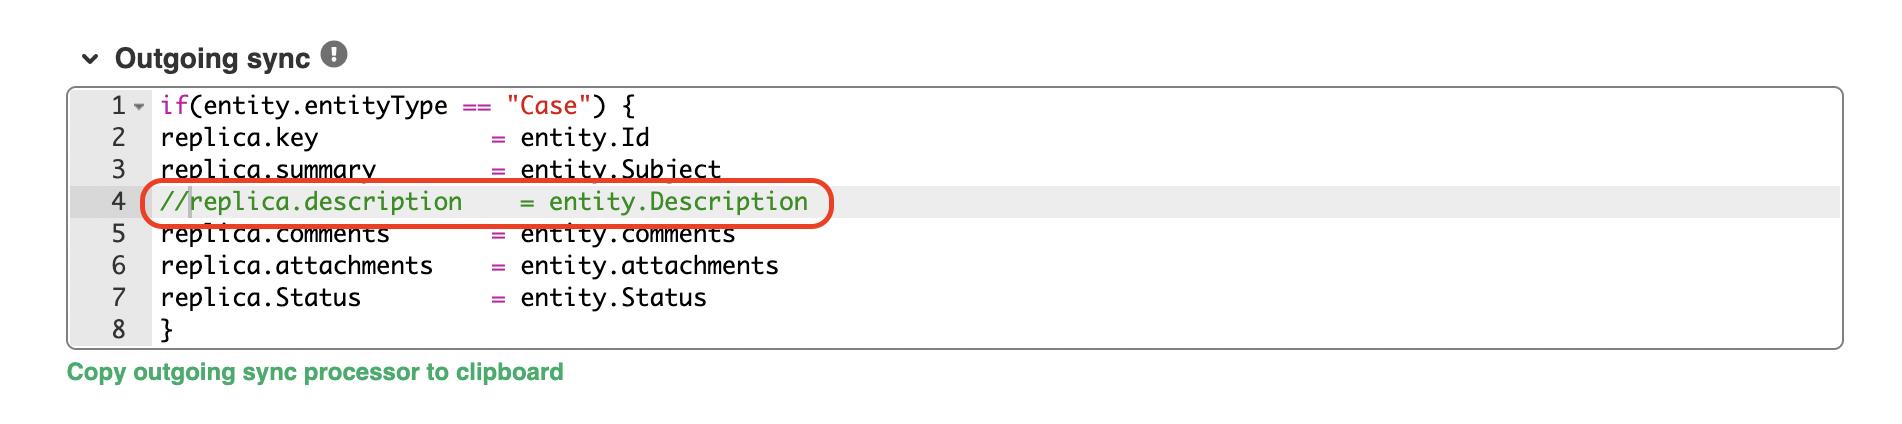 salesforce GitHub integration outgoing sync